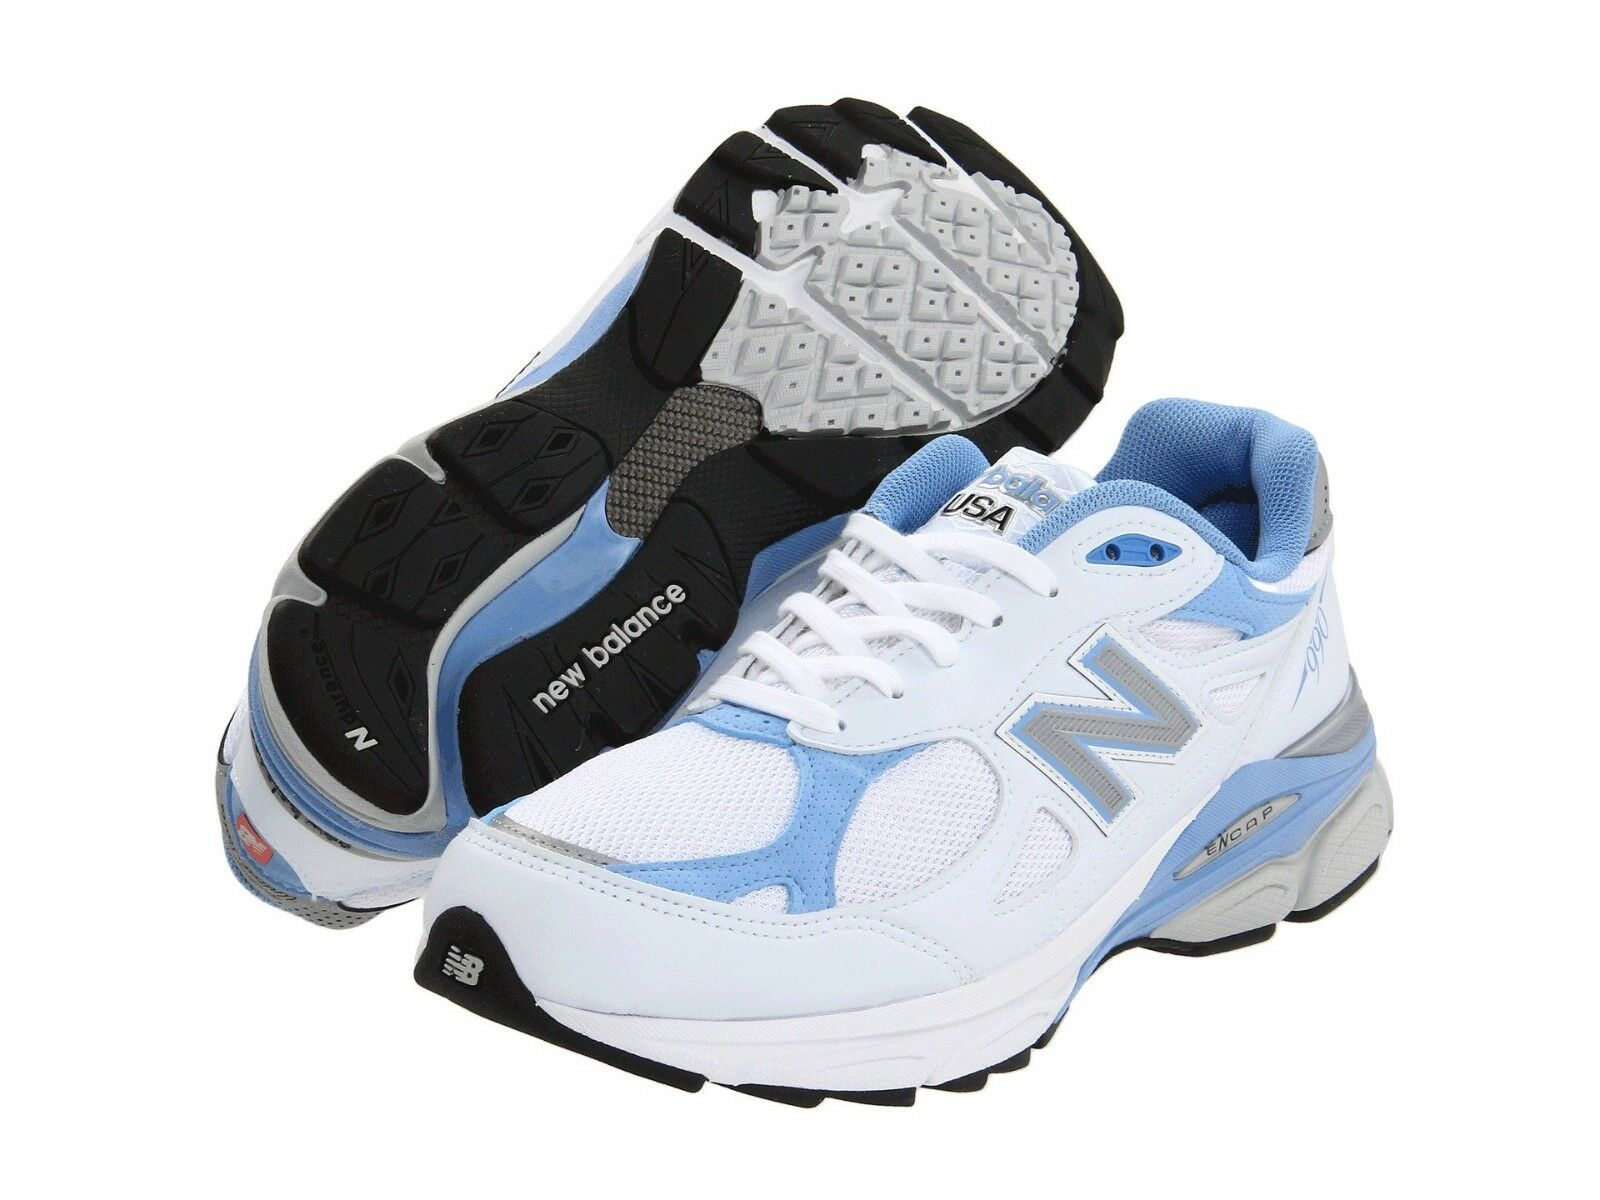 femmes  NEW BALANCE 990v3 RUNNING/DIABETIC  Chaussures -7 -7 -7 2A/EUR 37.5 NARROW-MADE IN USA 9b197d